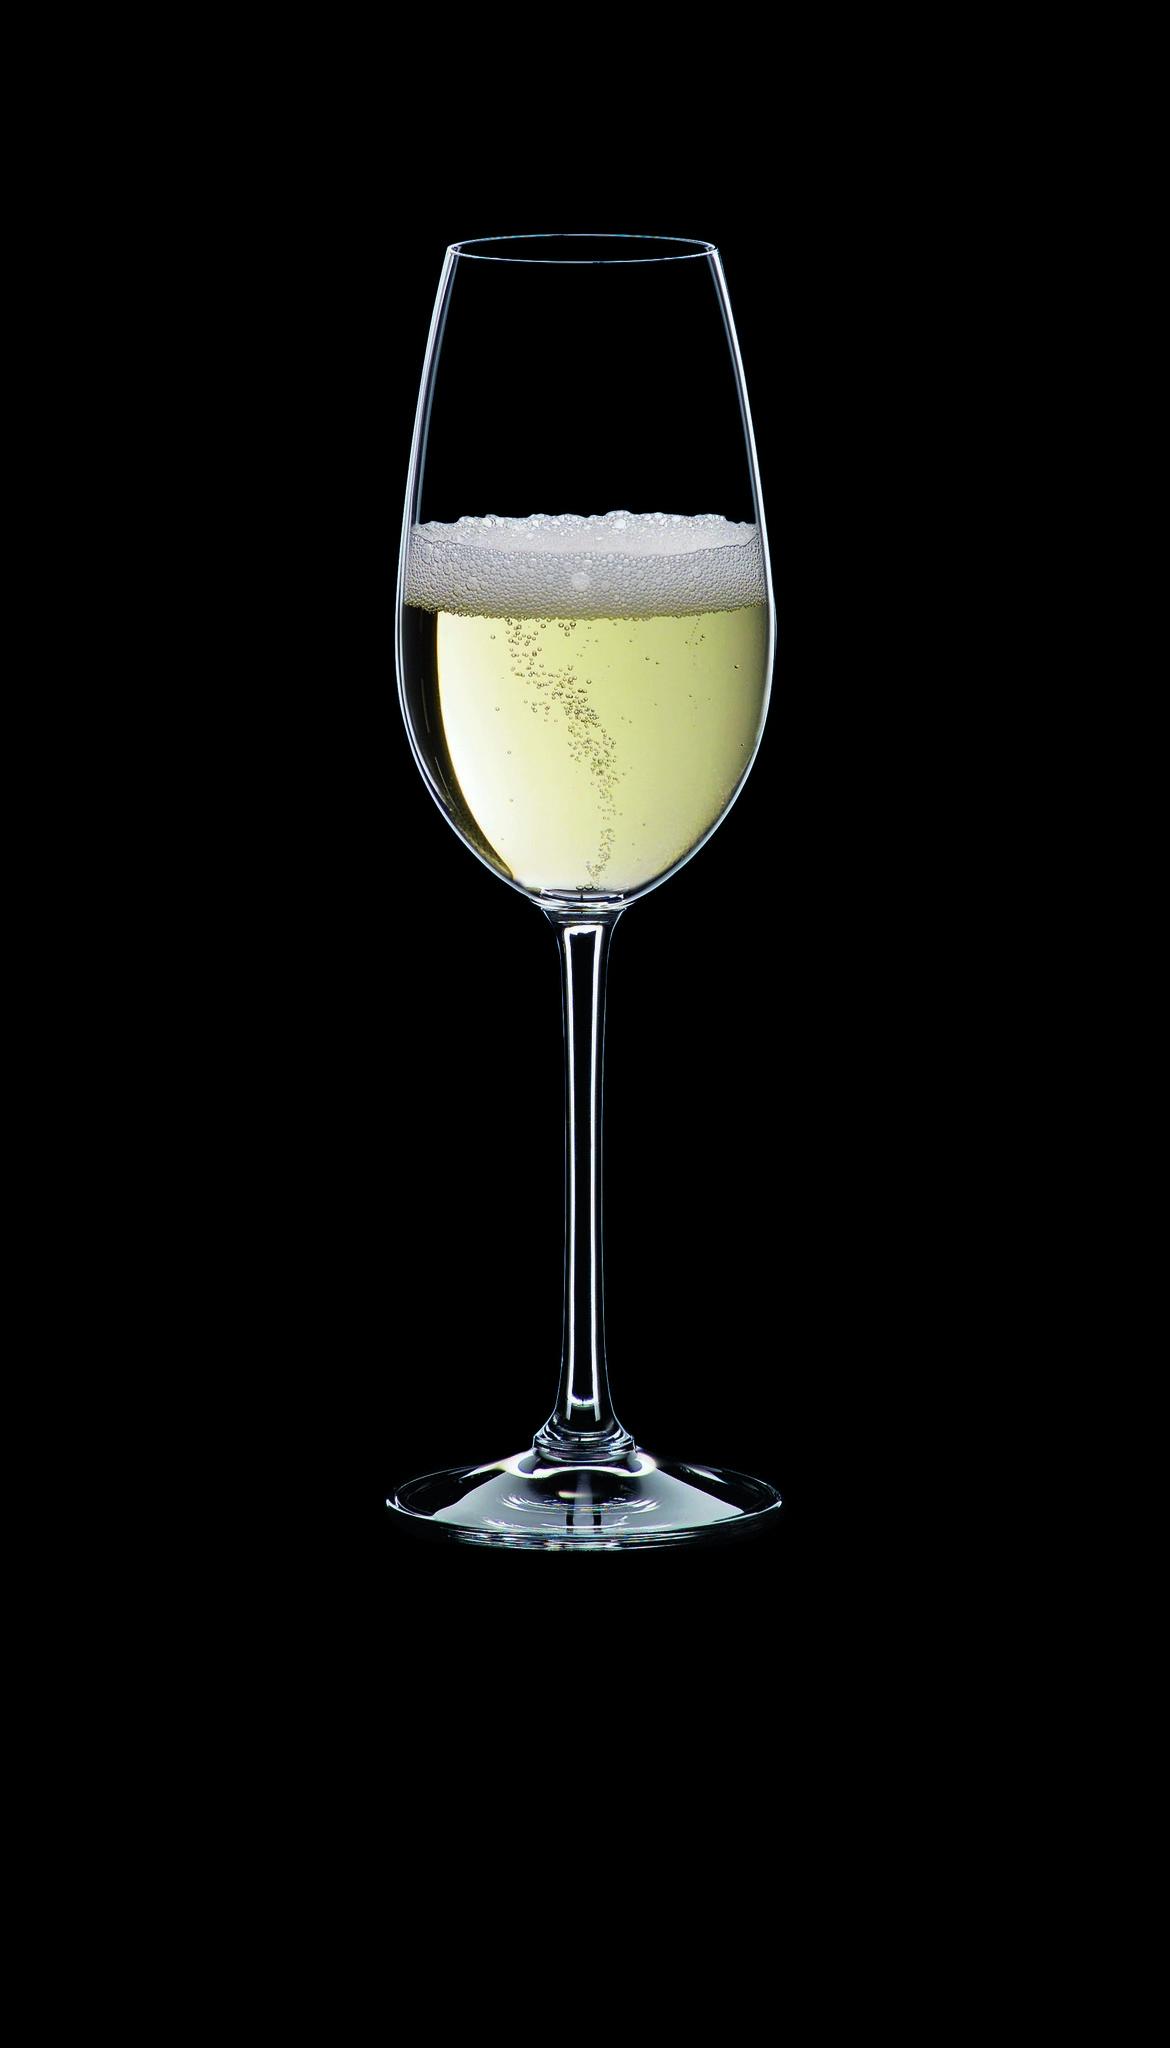 Набор из 4-х бокалов для шампанского Nachtmann VIvino, 260 мл набор фужеров для шампанского vivino хрустальное стекло 4 шт 95864 nachtmann